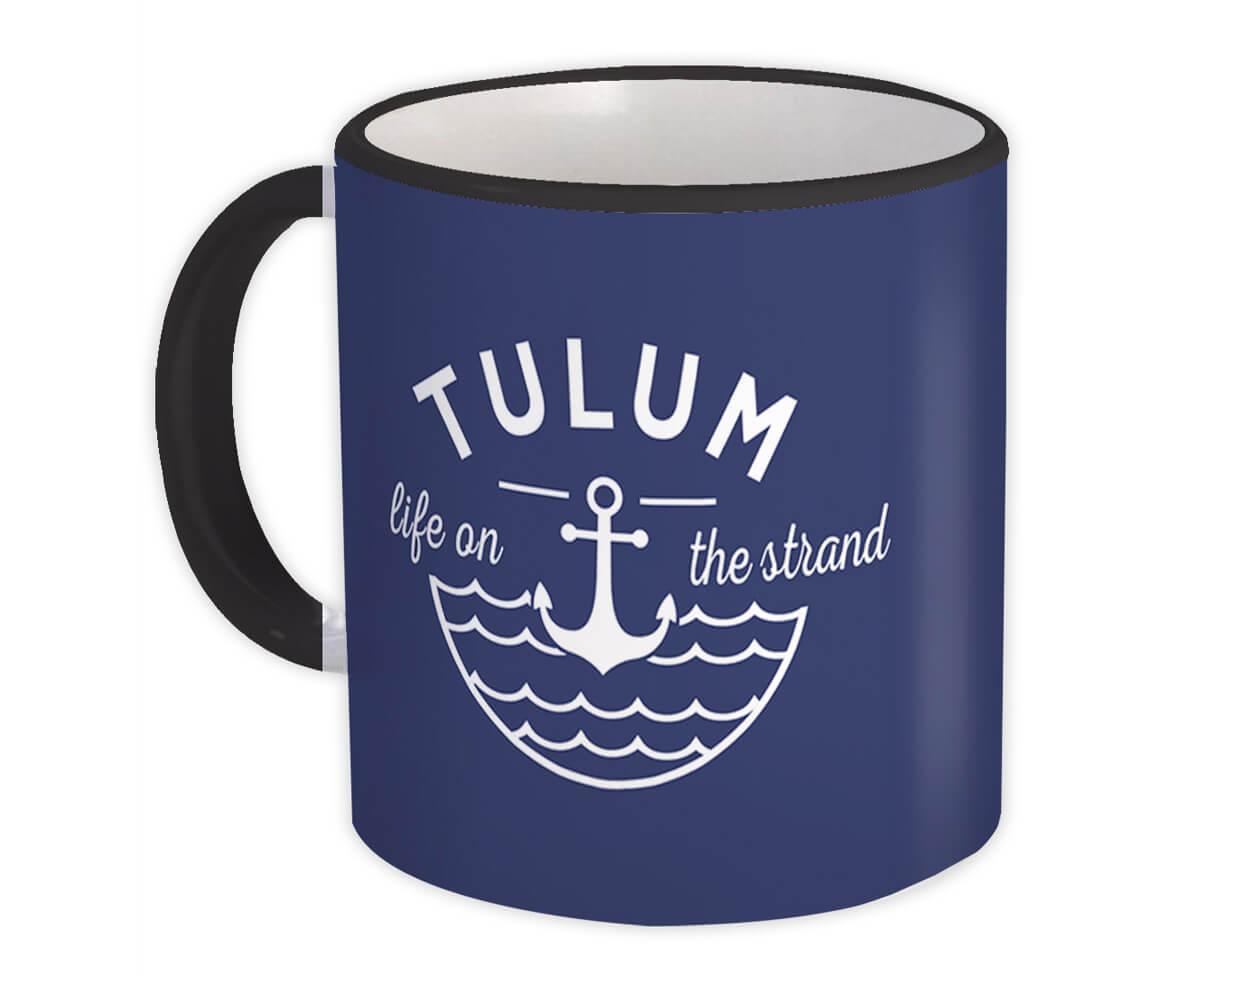 Tulum Life on the Strand : Gift Mug Beach Travel Souvenir Mexico